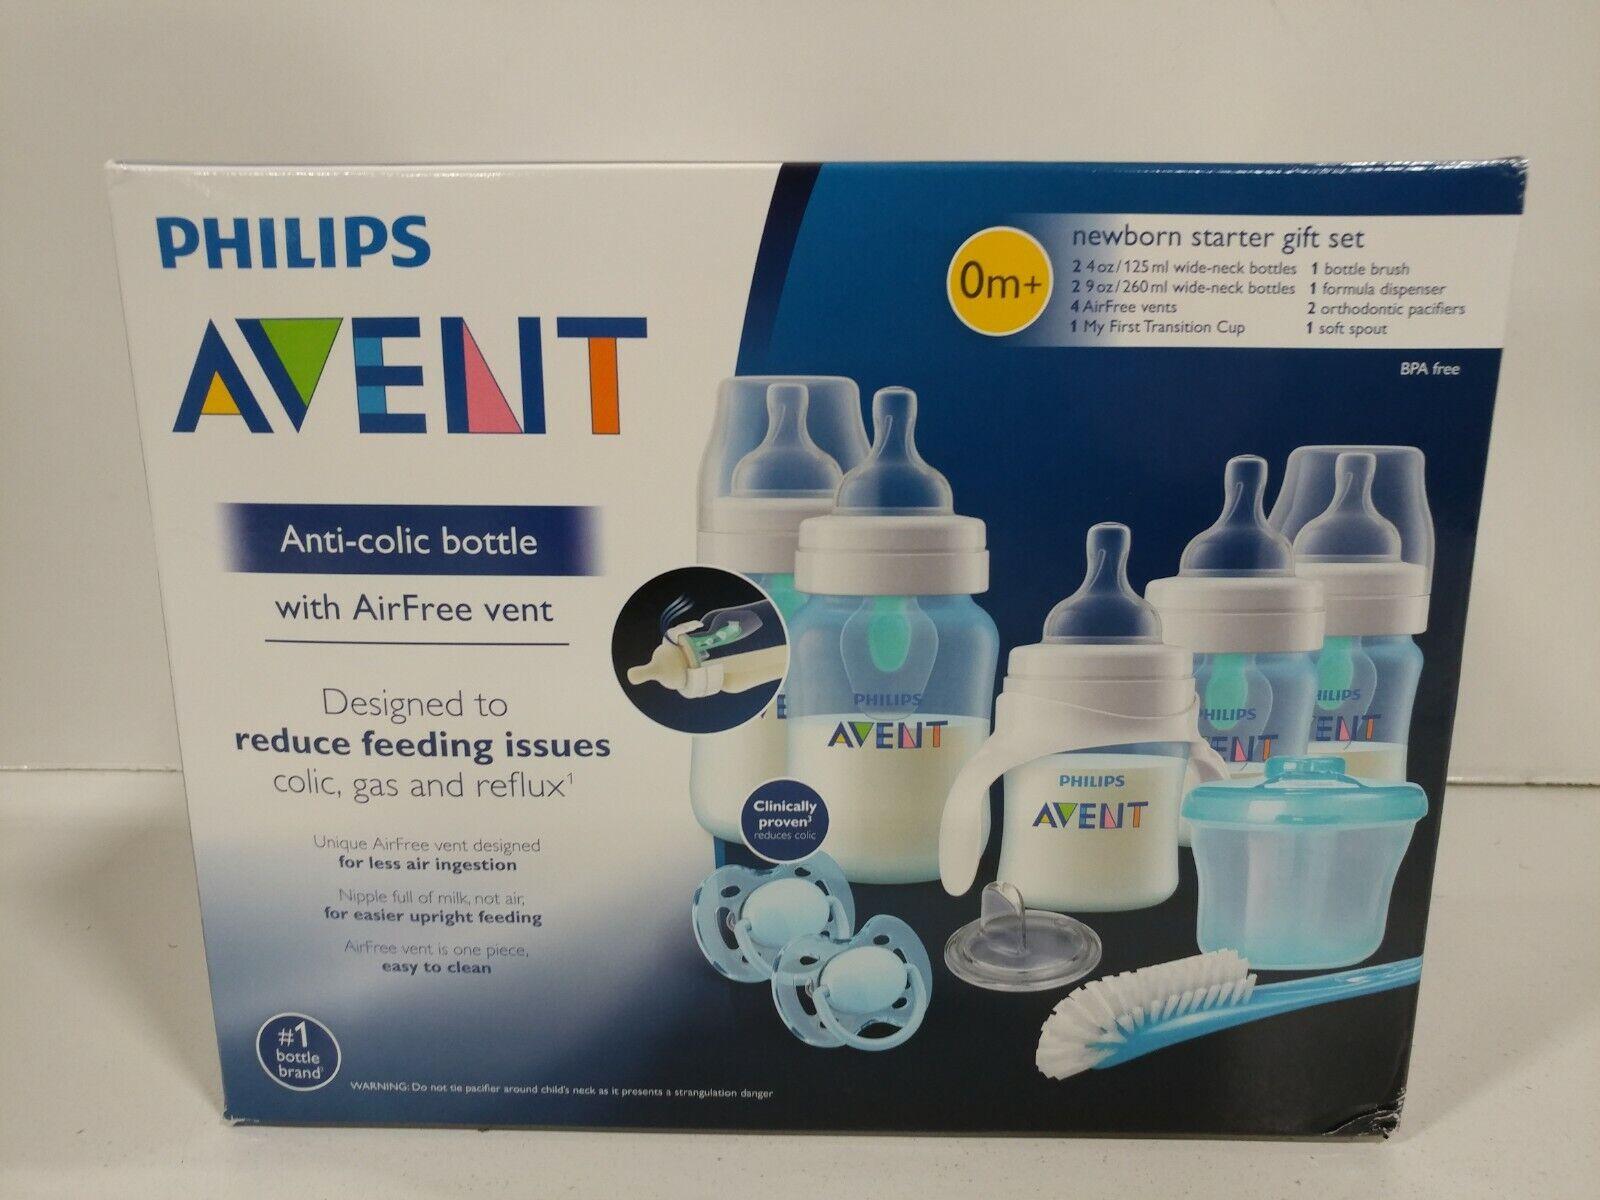 Philips Avent Baby Bottle Anti-Colic AirFree Vent Newborn Gi